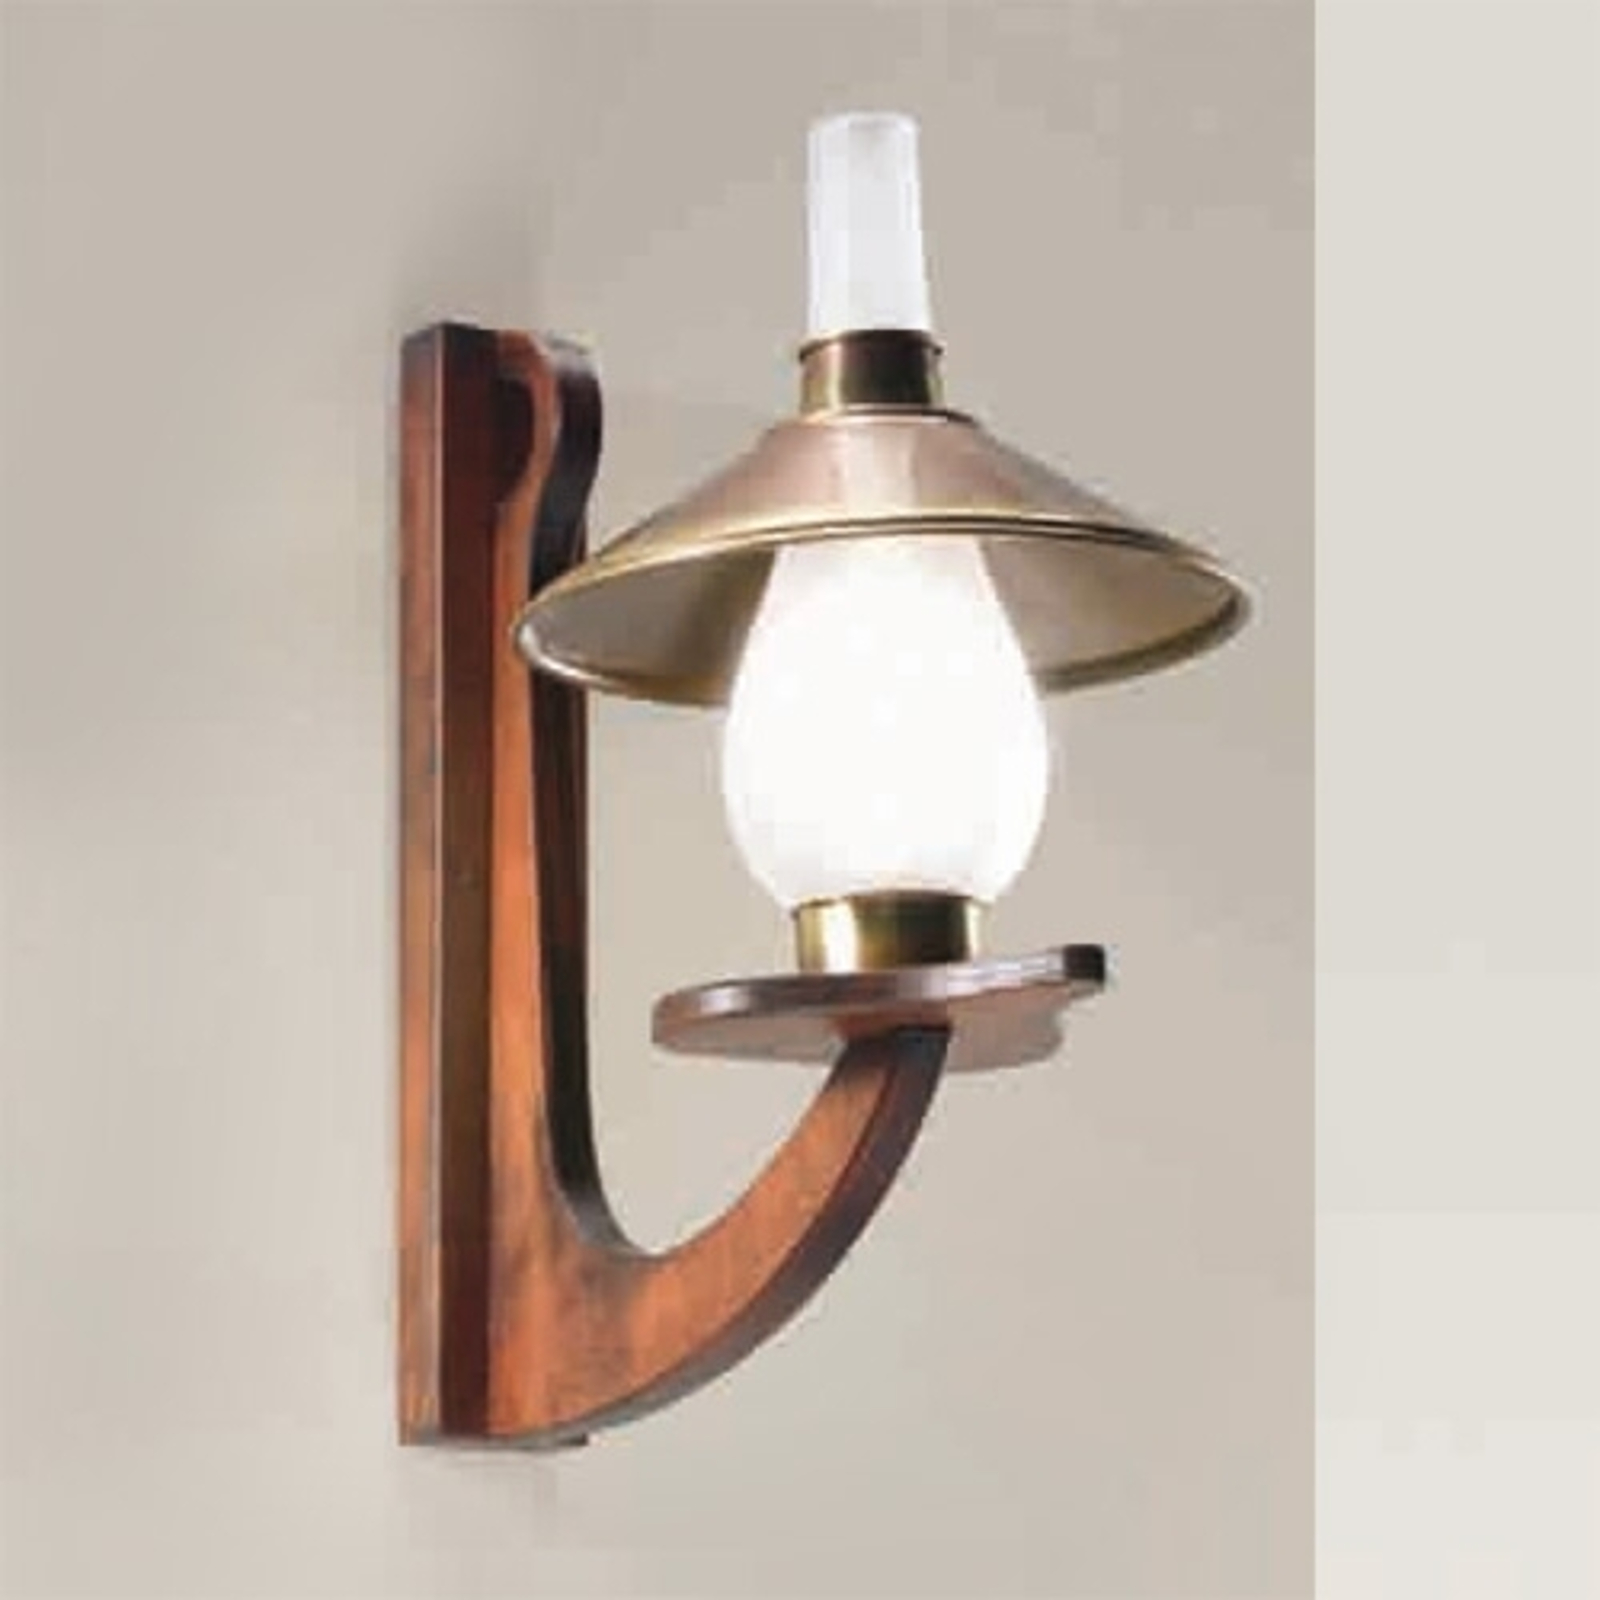 1-punktowa lampa ścienna Marea